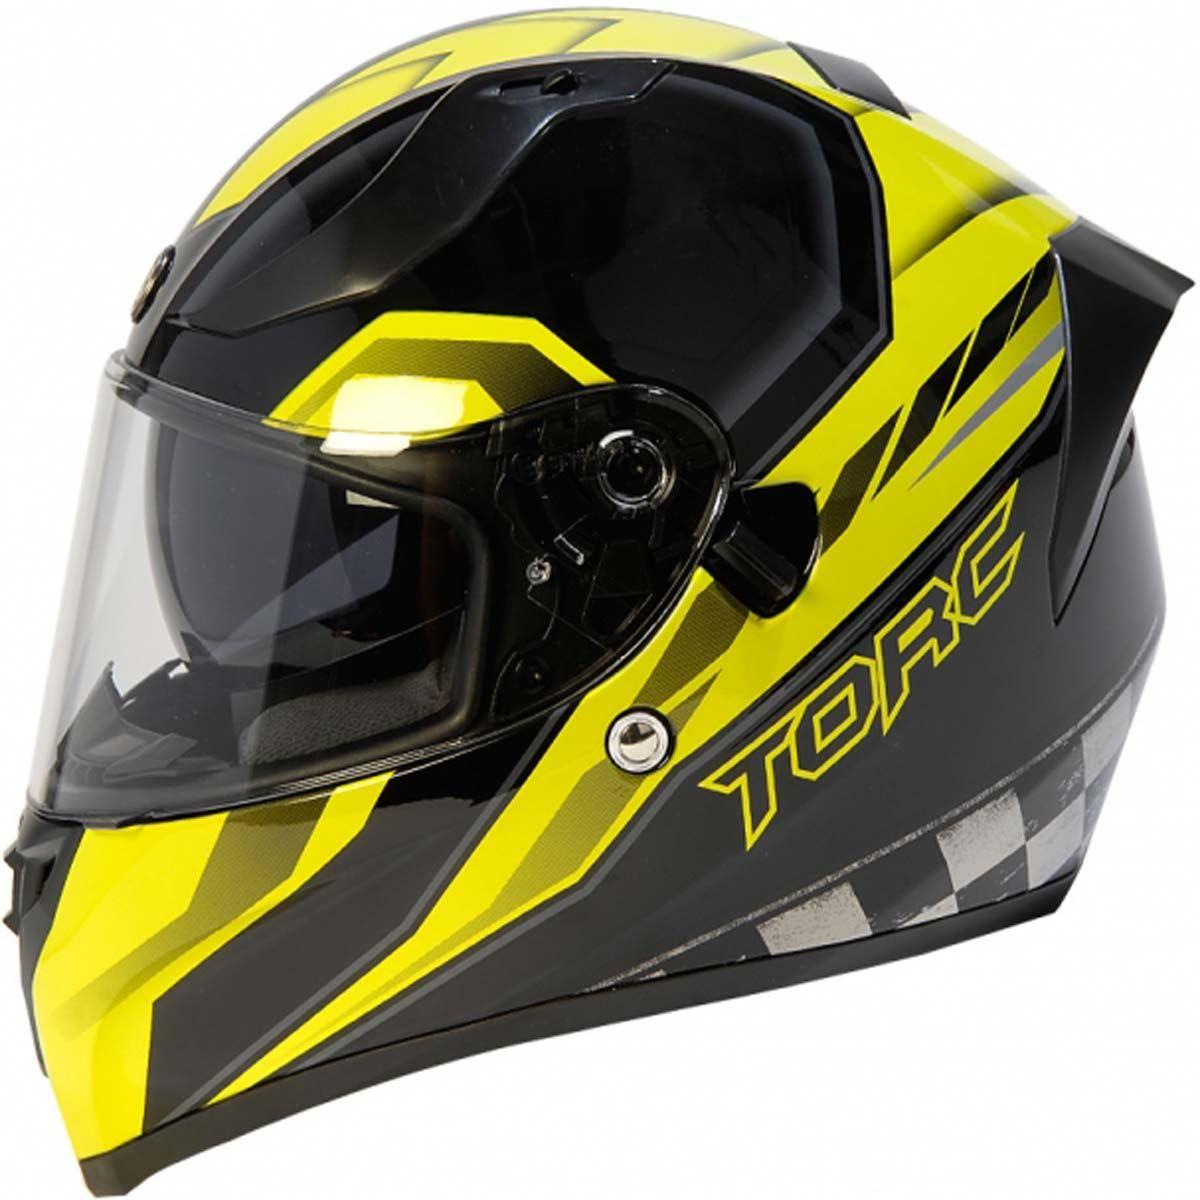 miniature 19 - Torc T15 T15B Helmet Bluetooth Blinc or without - Inner Sun Shield DOT XS-2XL